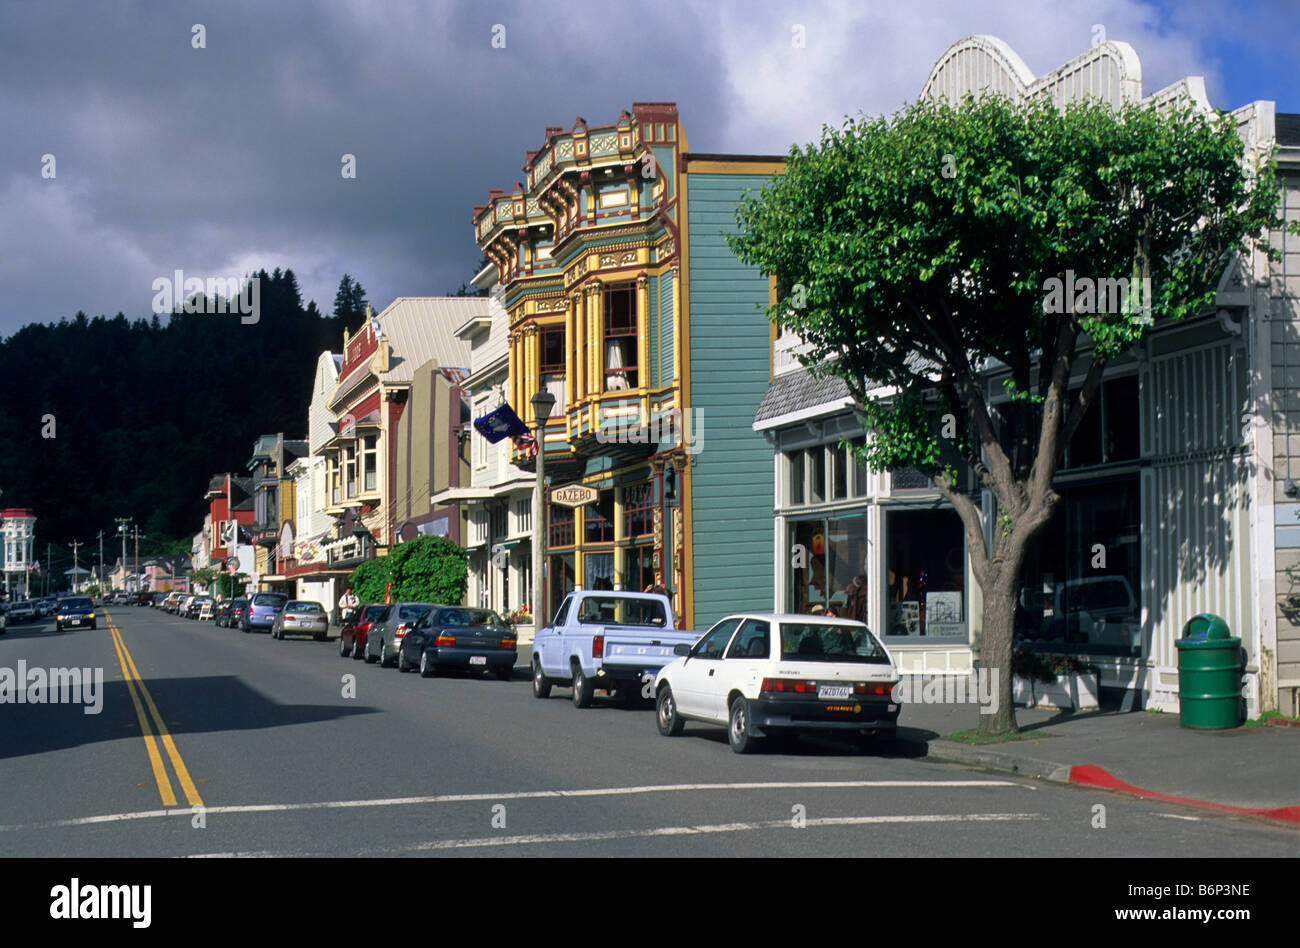 Scene Rustic Storefront Stockfotos & Scene Rustic Storefront Bilder ...